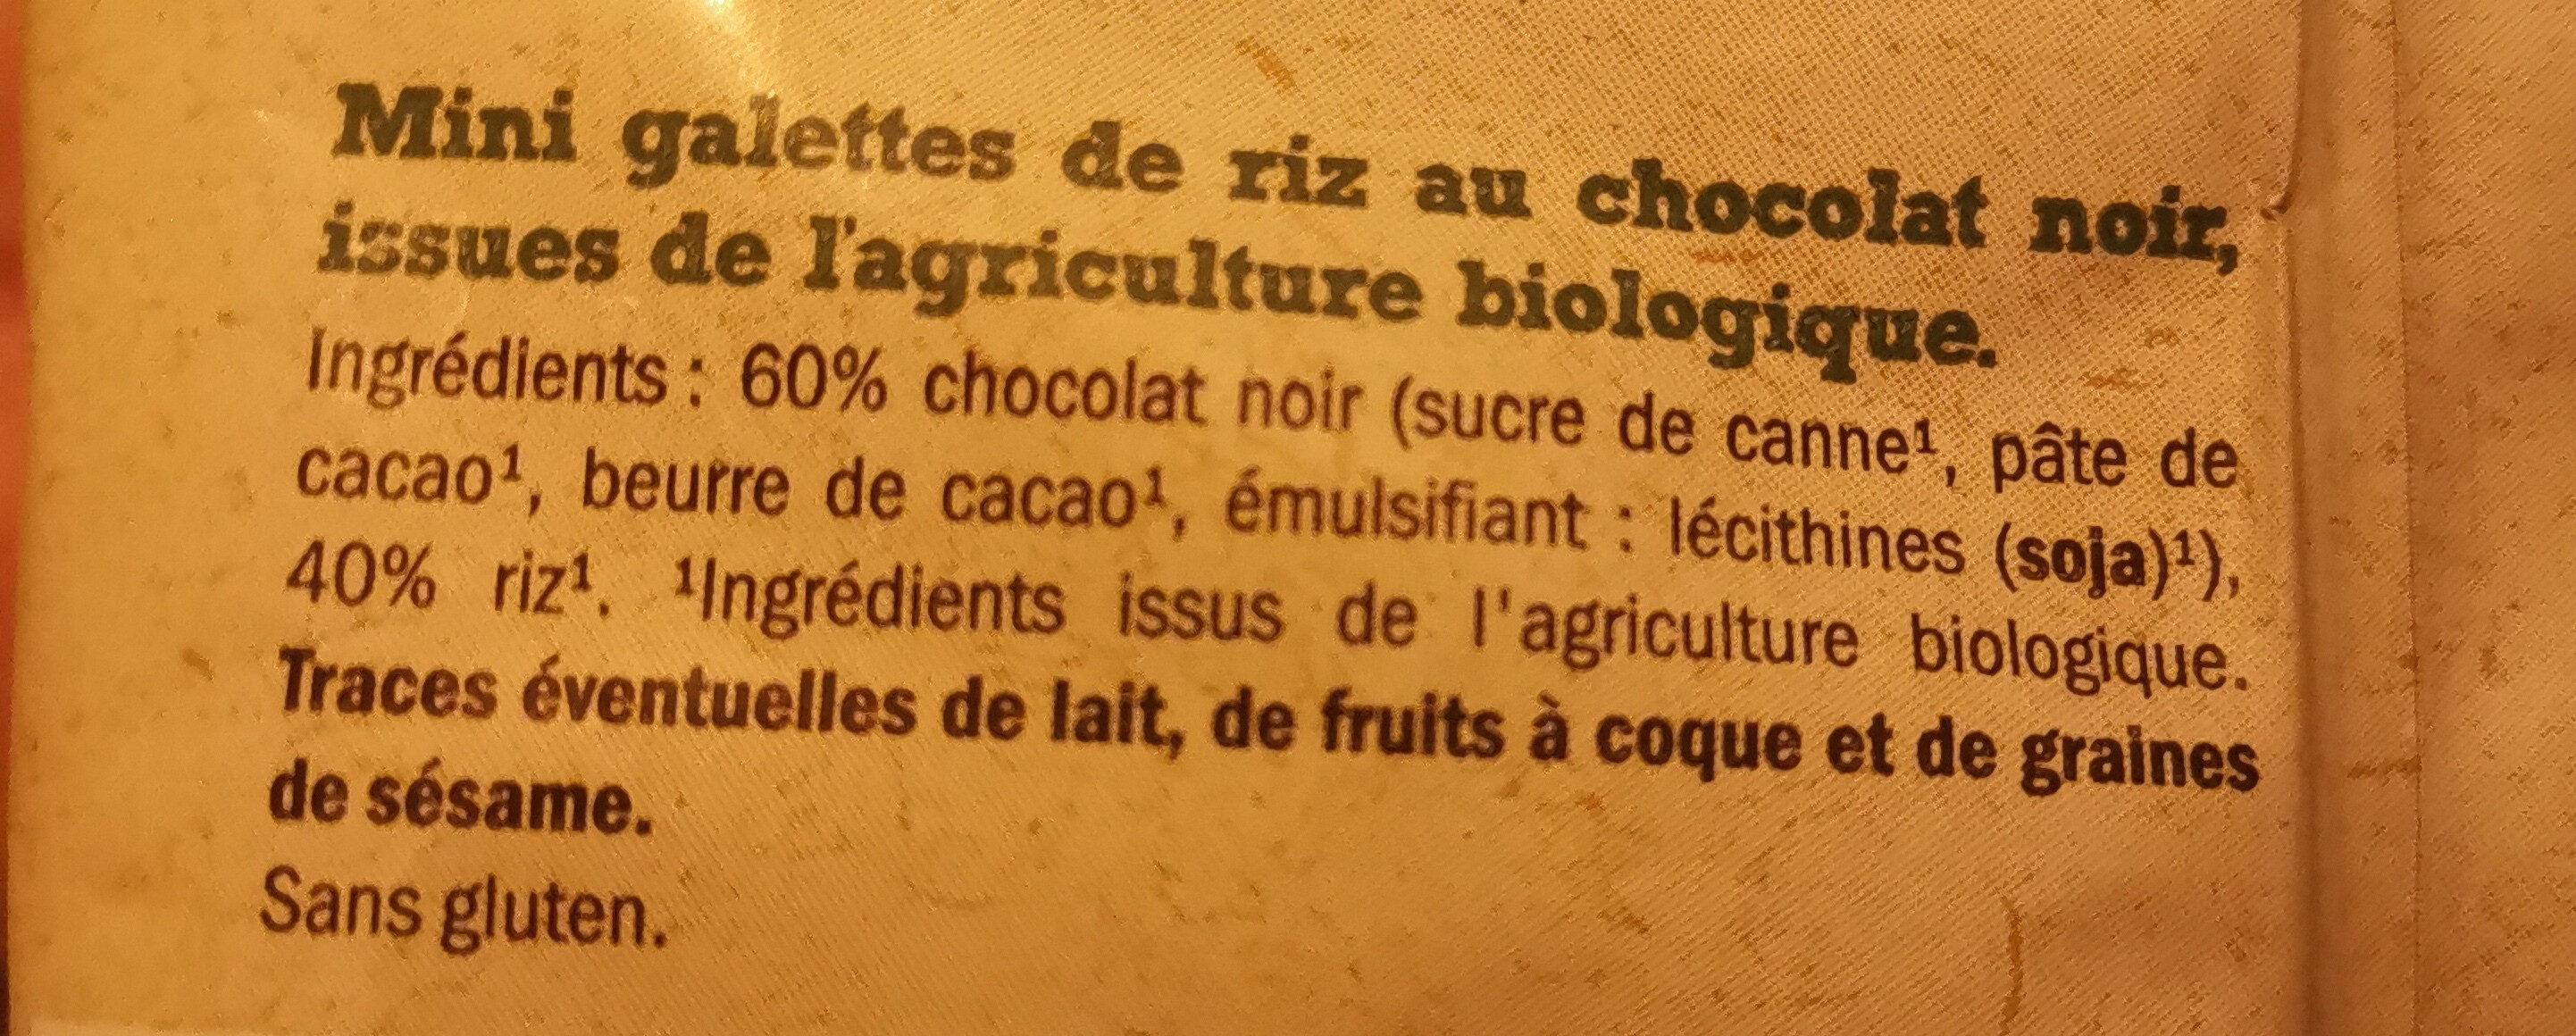 MINI GALETTES DE RIZ CHOCOLAT NOIR - Ingredienti - fr